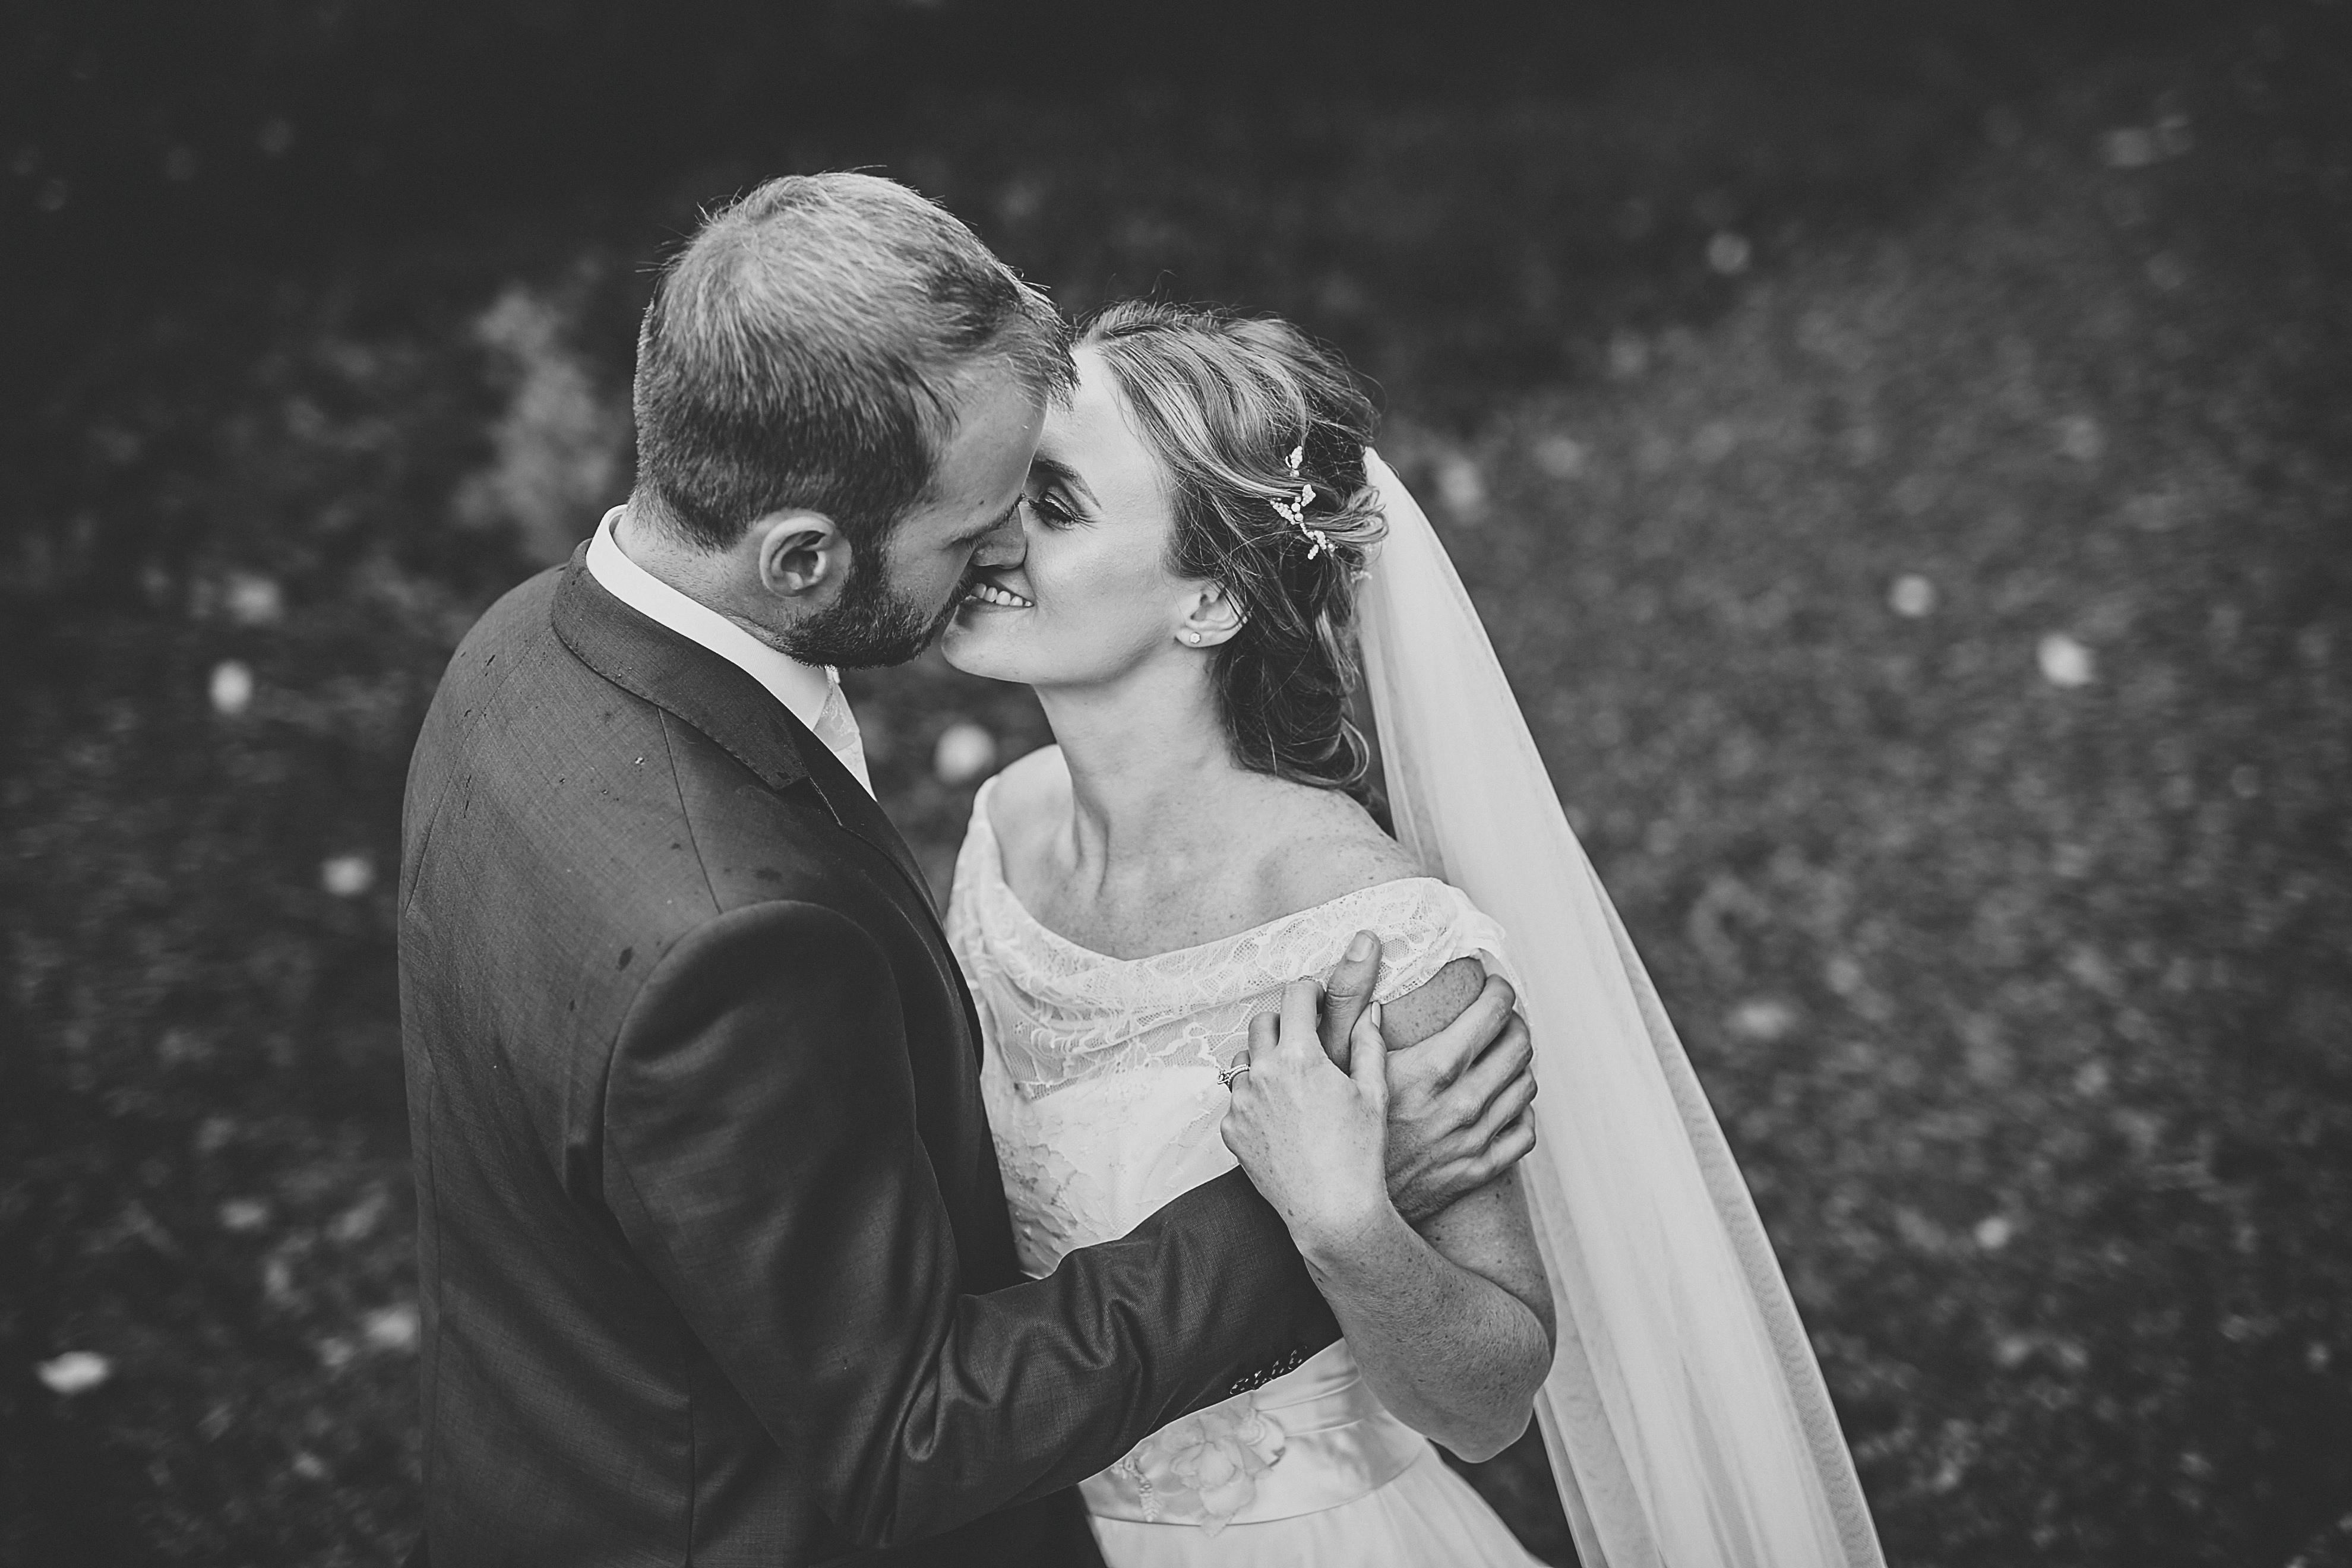 Cloughjordan House weddding105 - Cloughjordan House Wedding - Alternative Venue